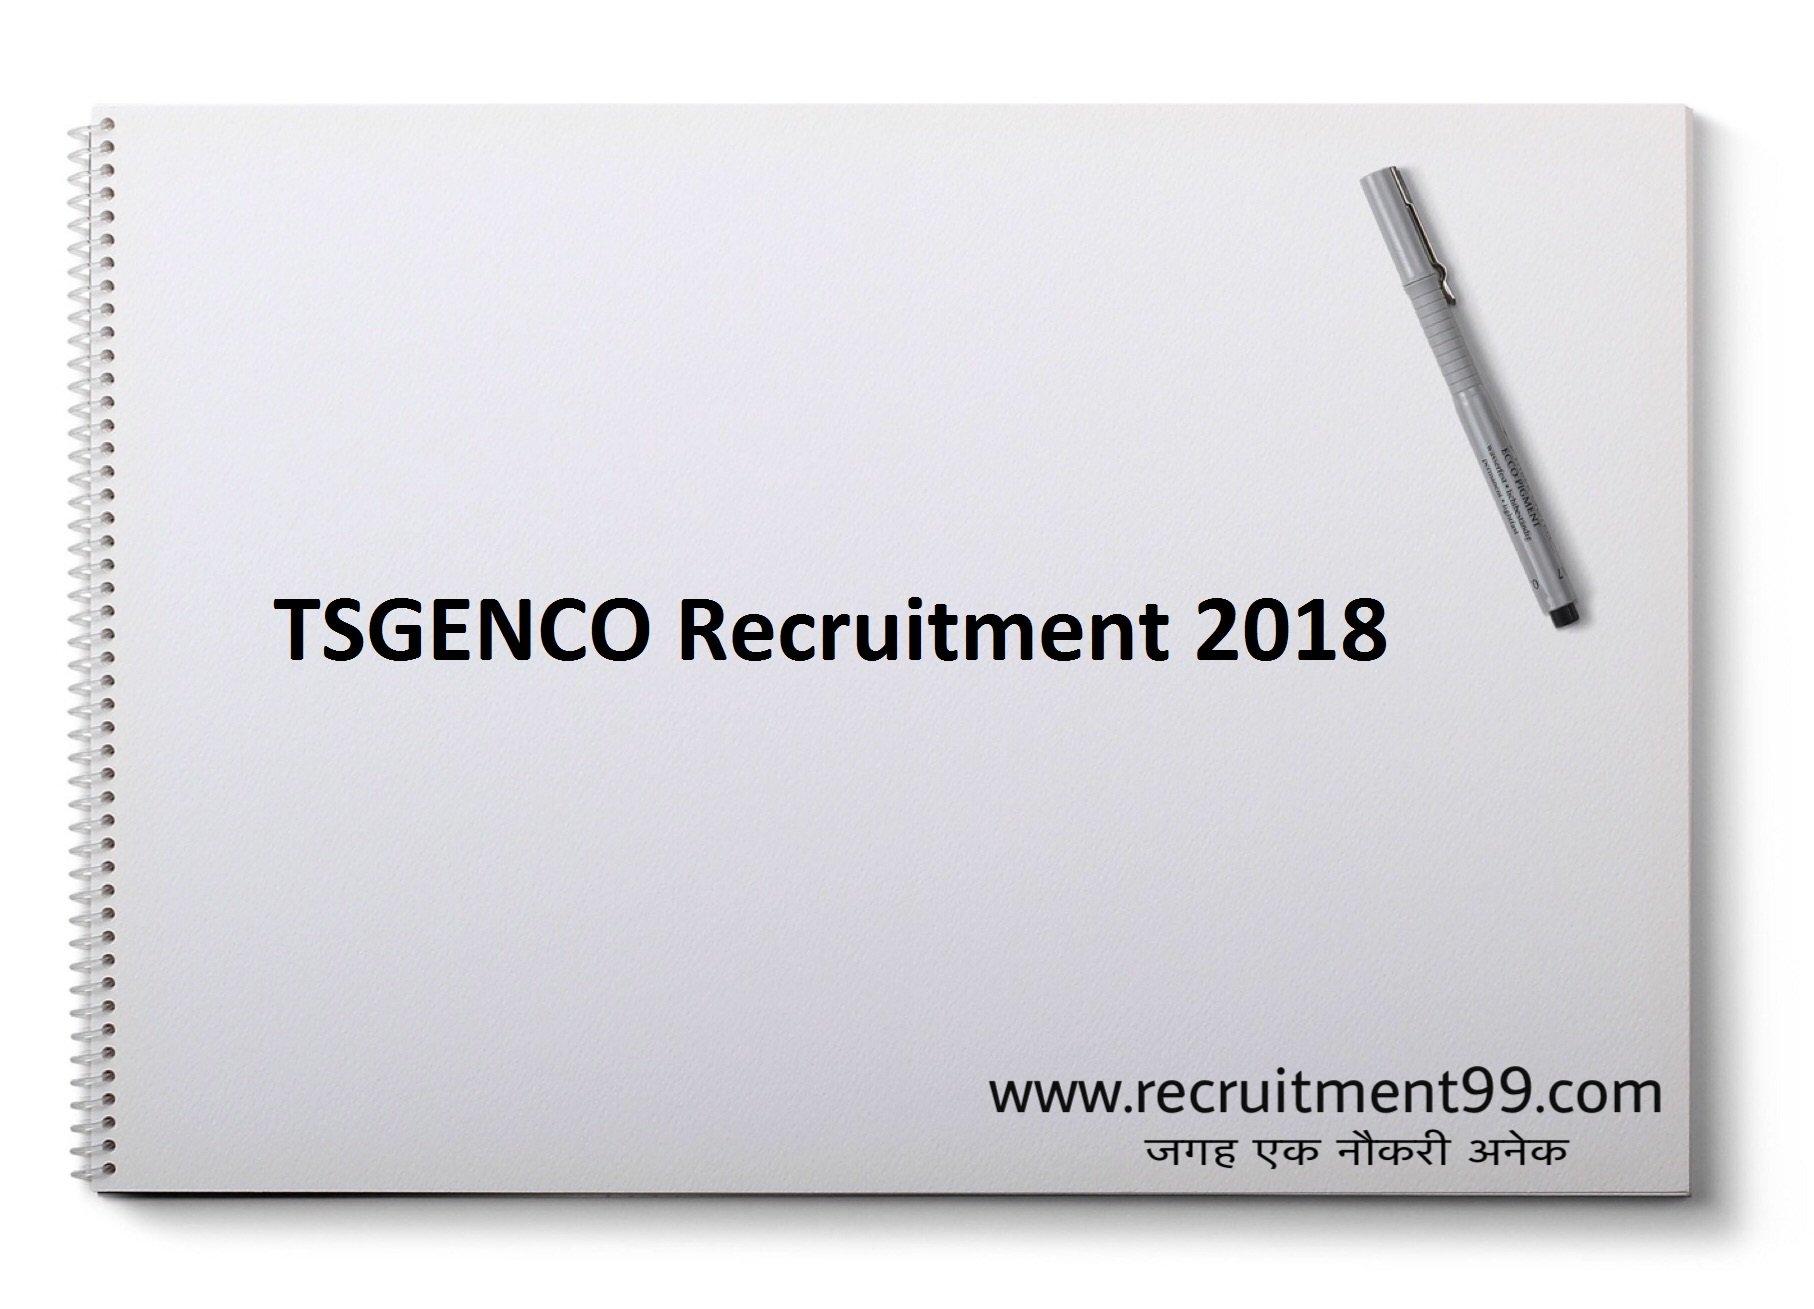 TSGENCO JAO Recruitment Admit Card & Result 2018